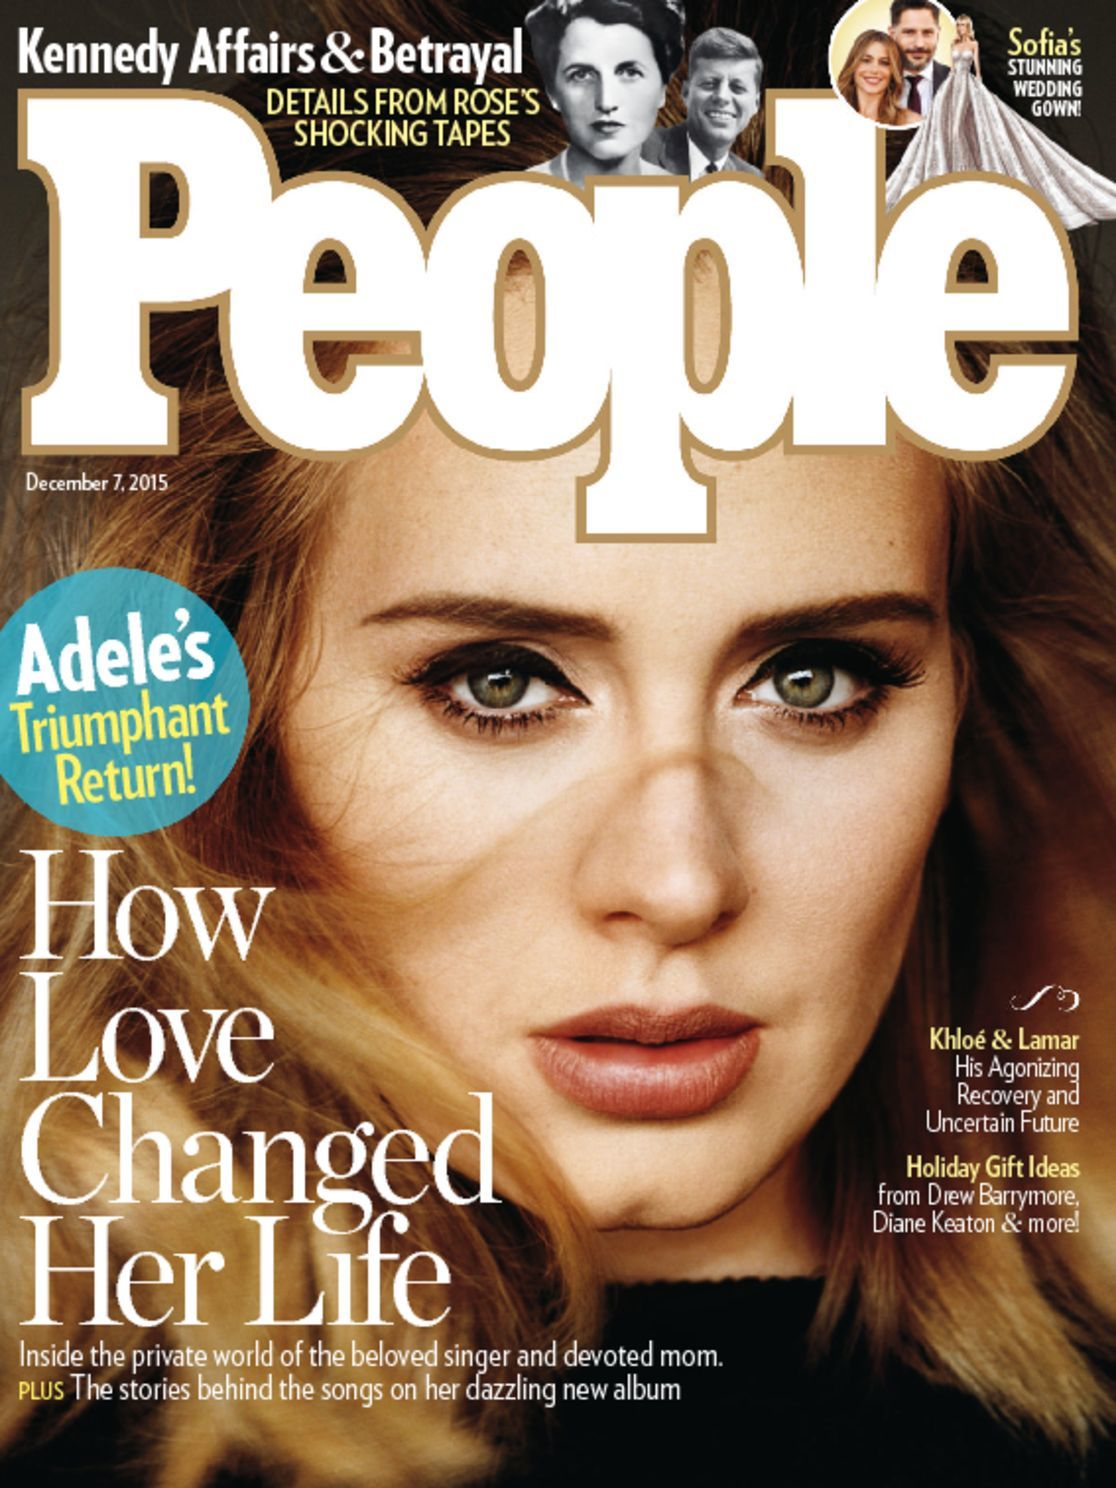 adele magazine covers bach barbara kennedy rose issue starr subscription mag joe ringo magazines celebrity inside ever marriage mistress latest